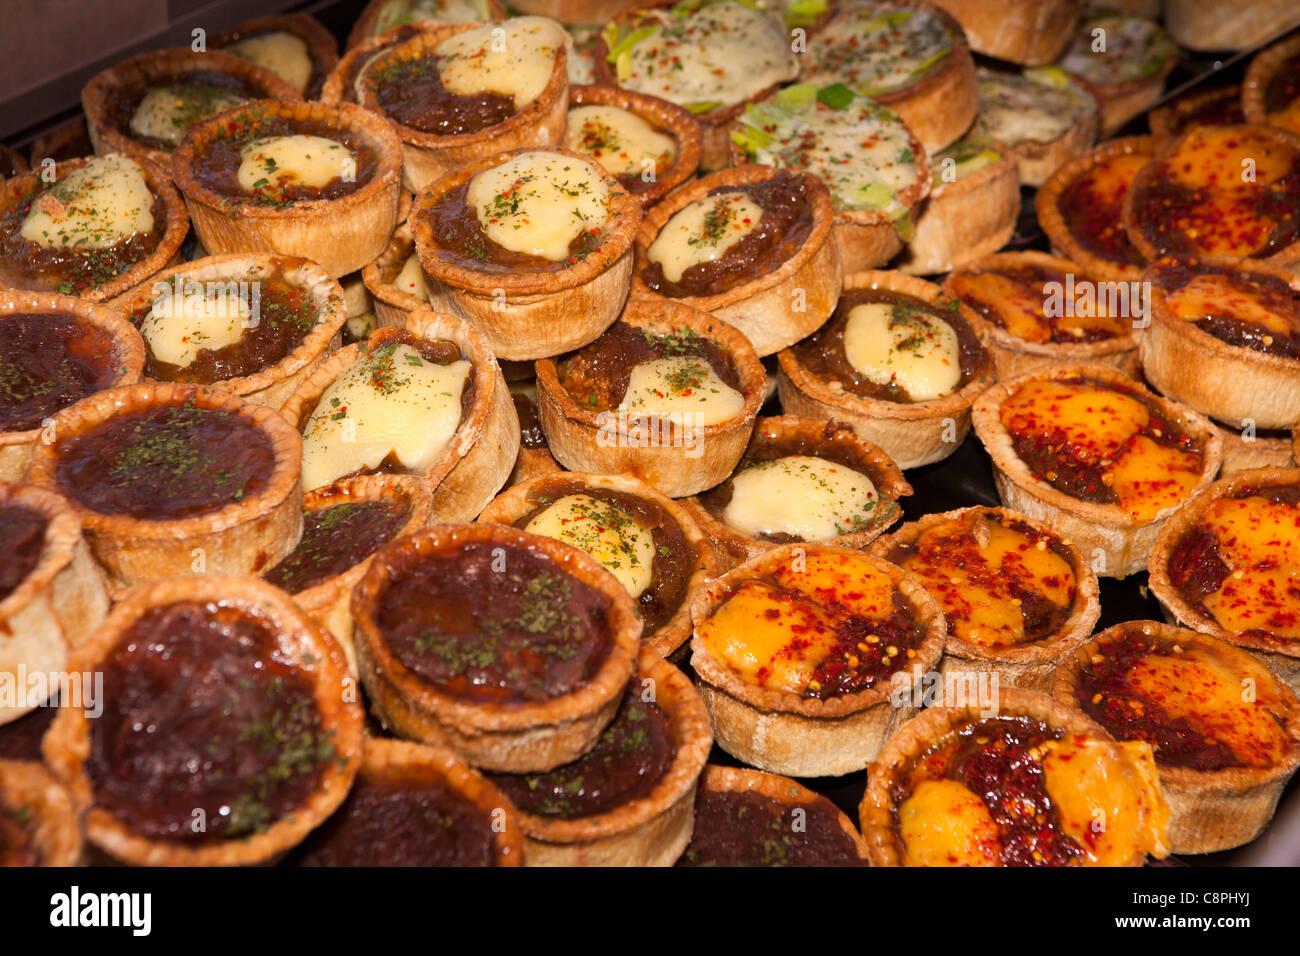 UK, Nottinghamshire, Nottingham, Old Market Square, world village market, posh pork pie company stall - Stock Image